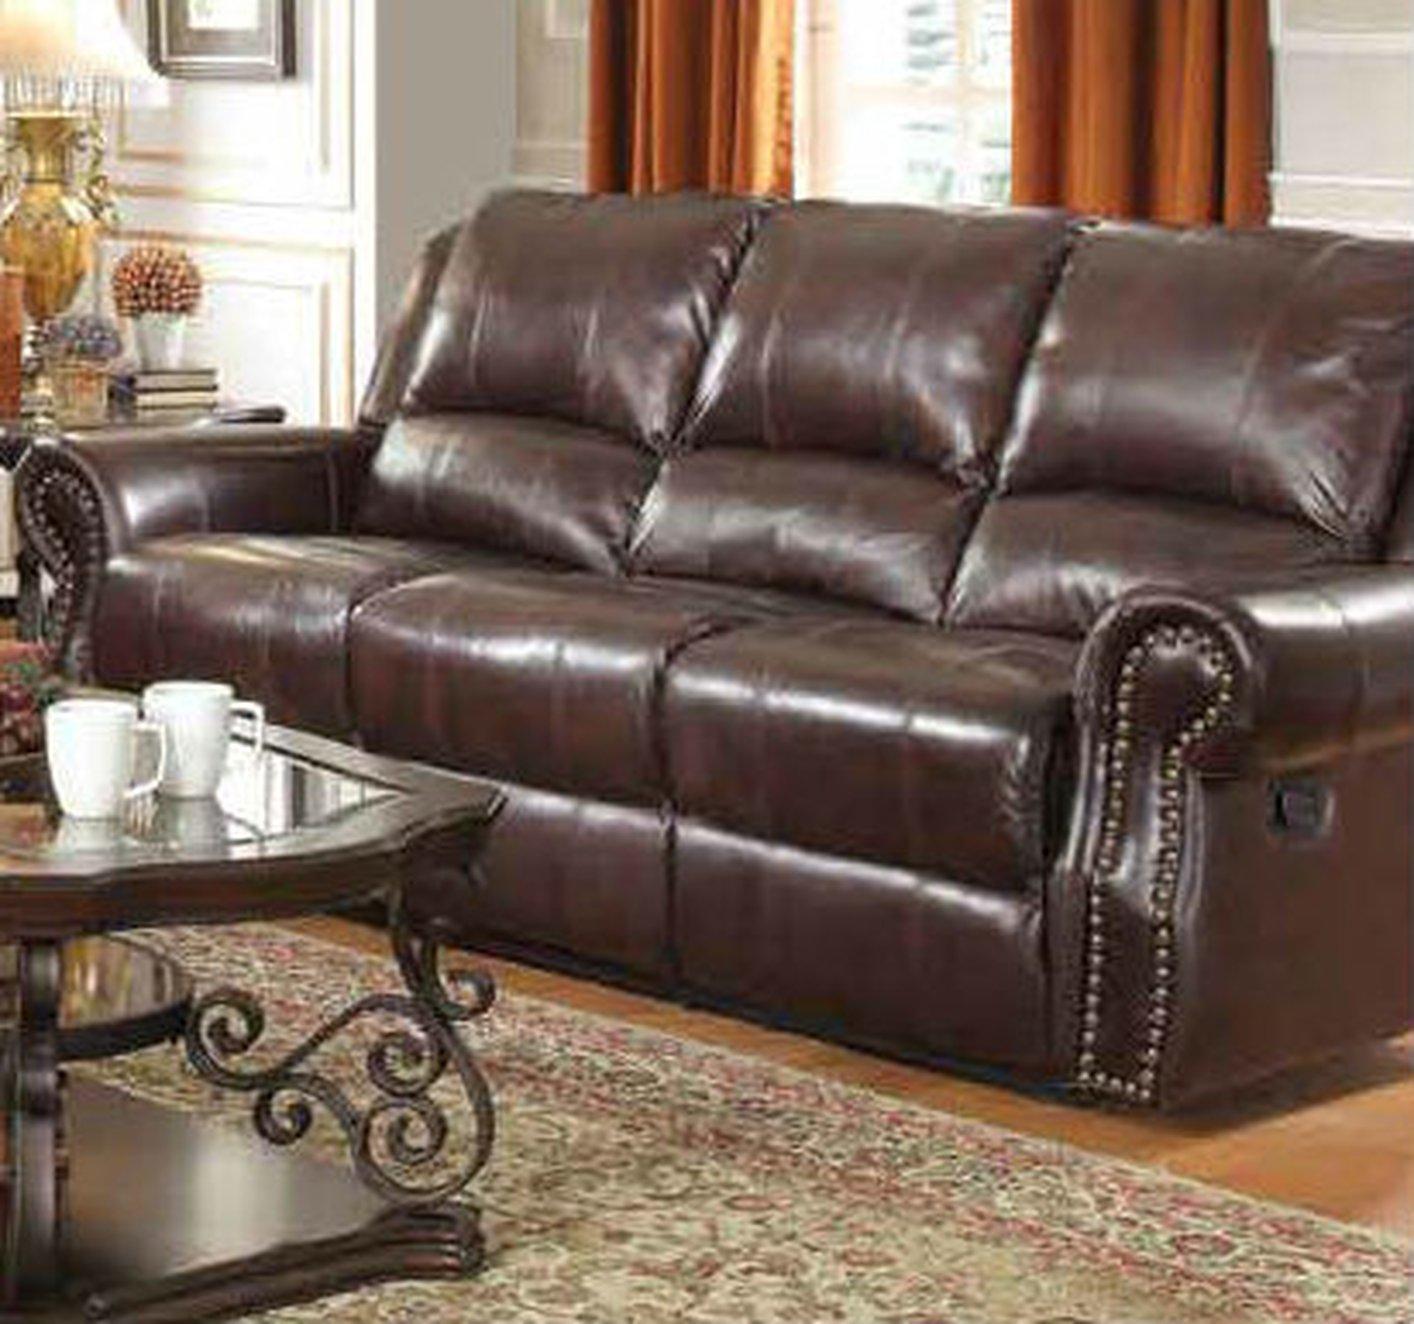 berkline recliner sofa dundee vs celtic sofascore 20 top leather sofas ideas